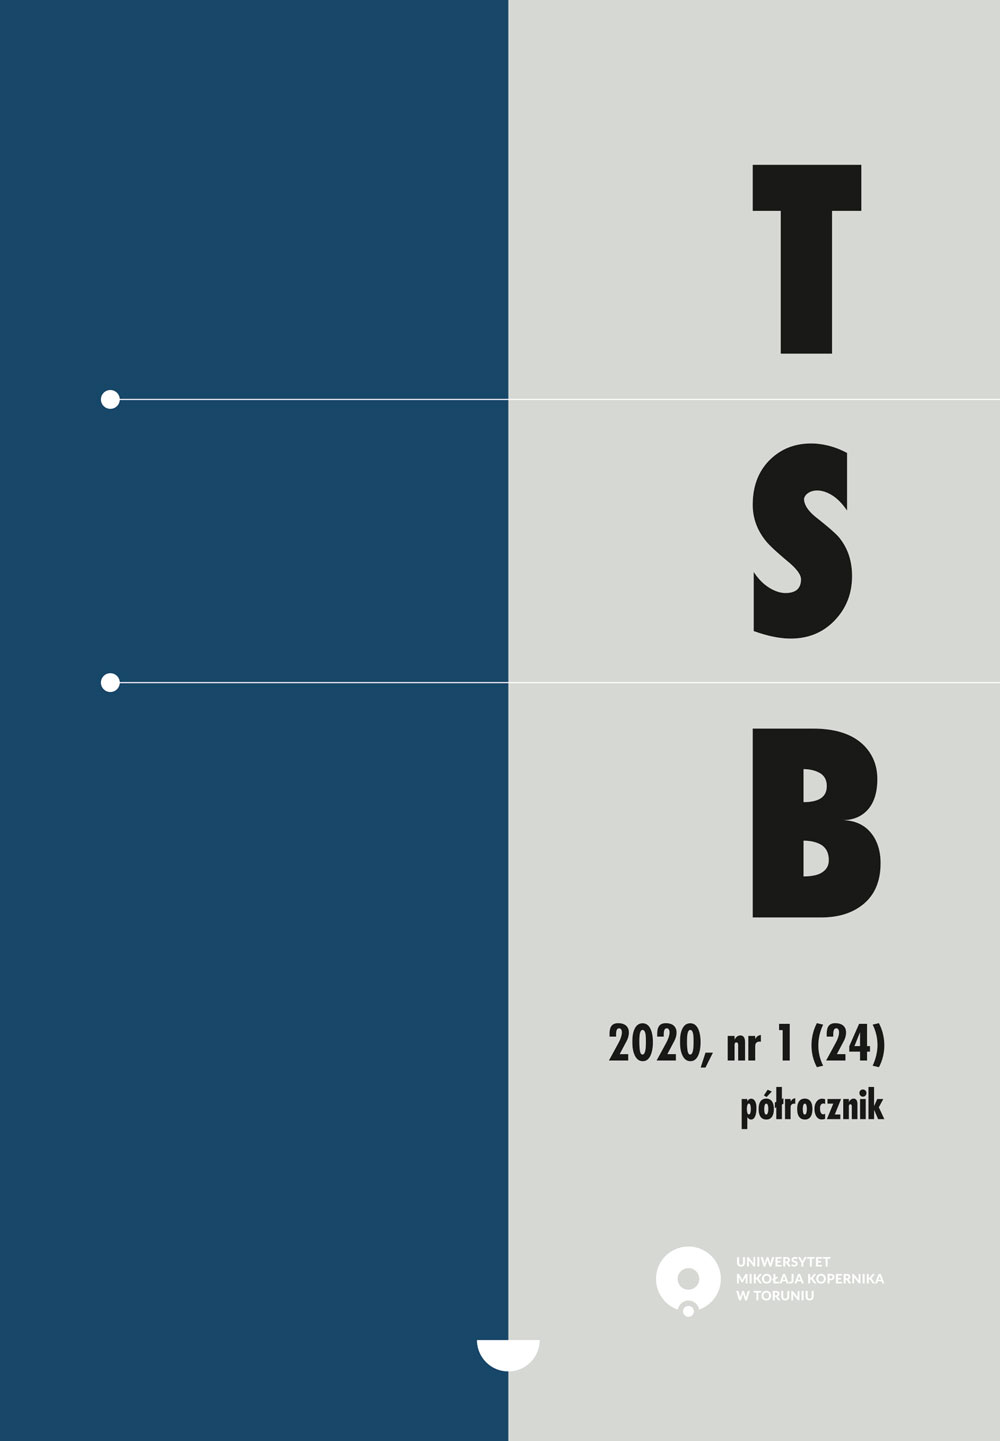 Vol 13 Nr 1 (24) 2020